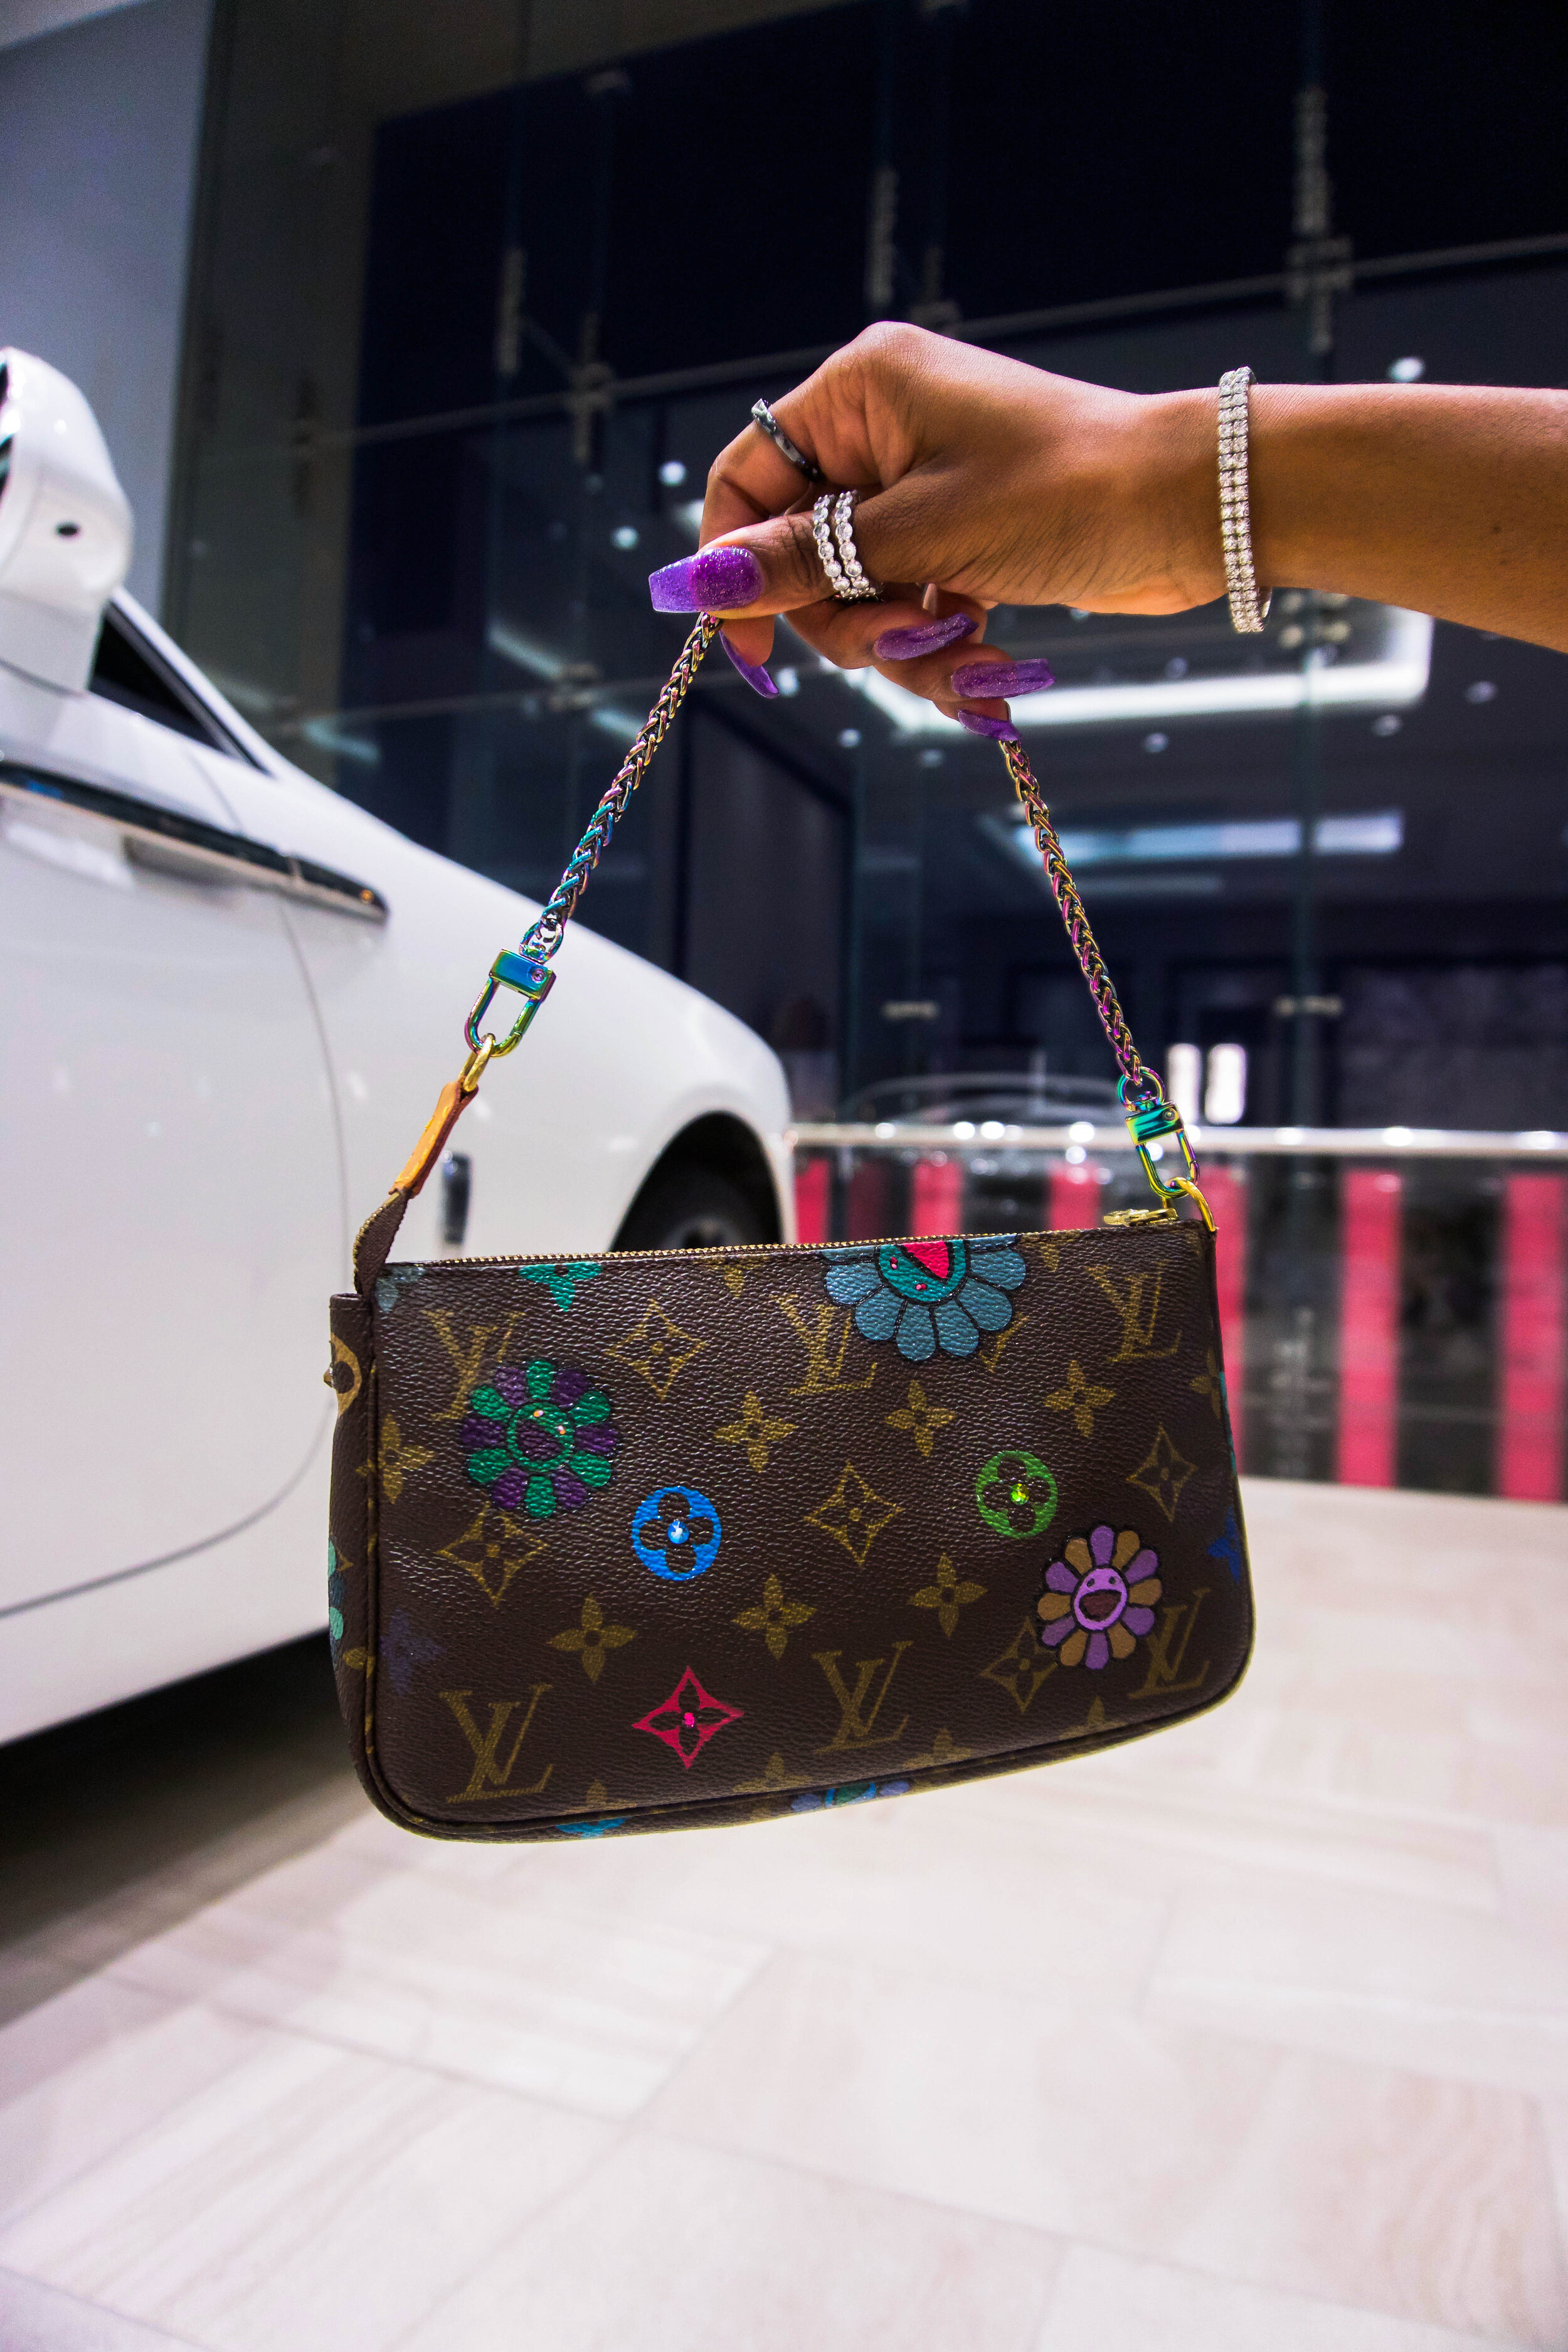 Bag:   Louis Vuitton x BTD